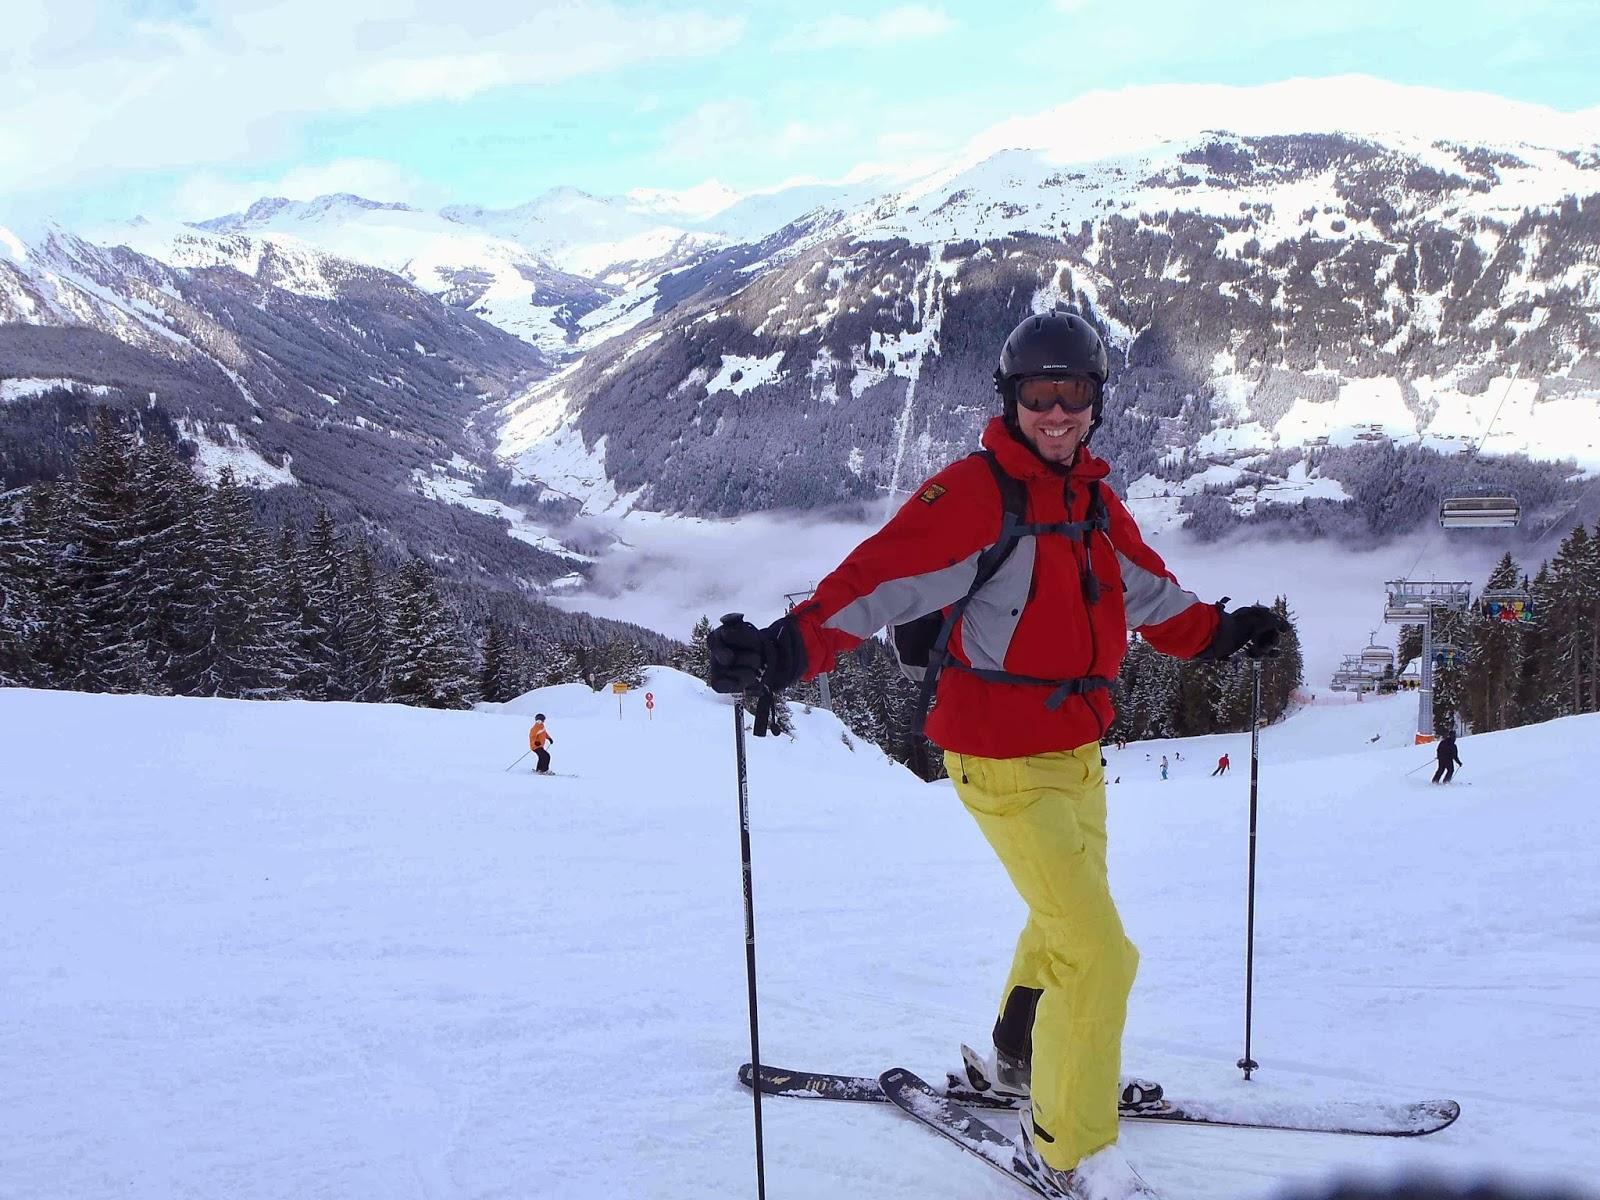 Simon Heyes skiing in Mayrhofen, Zillertal, Austria